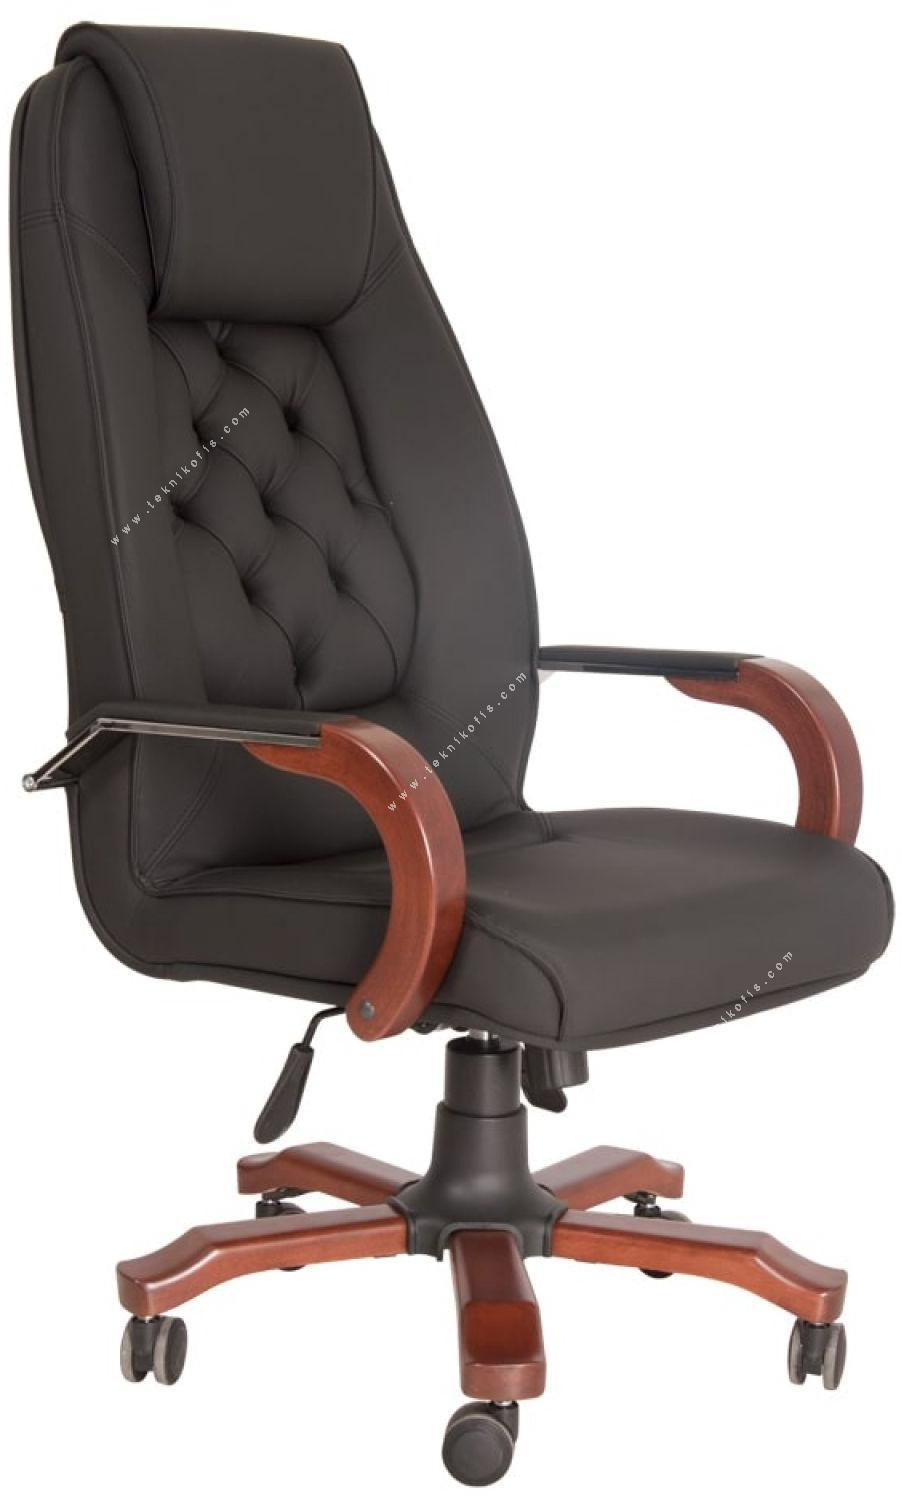 plank kapitoneli makam koltuğu